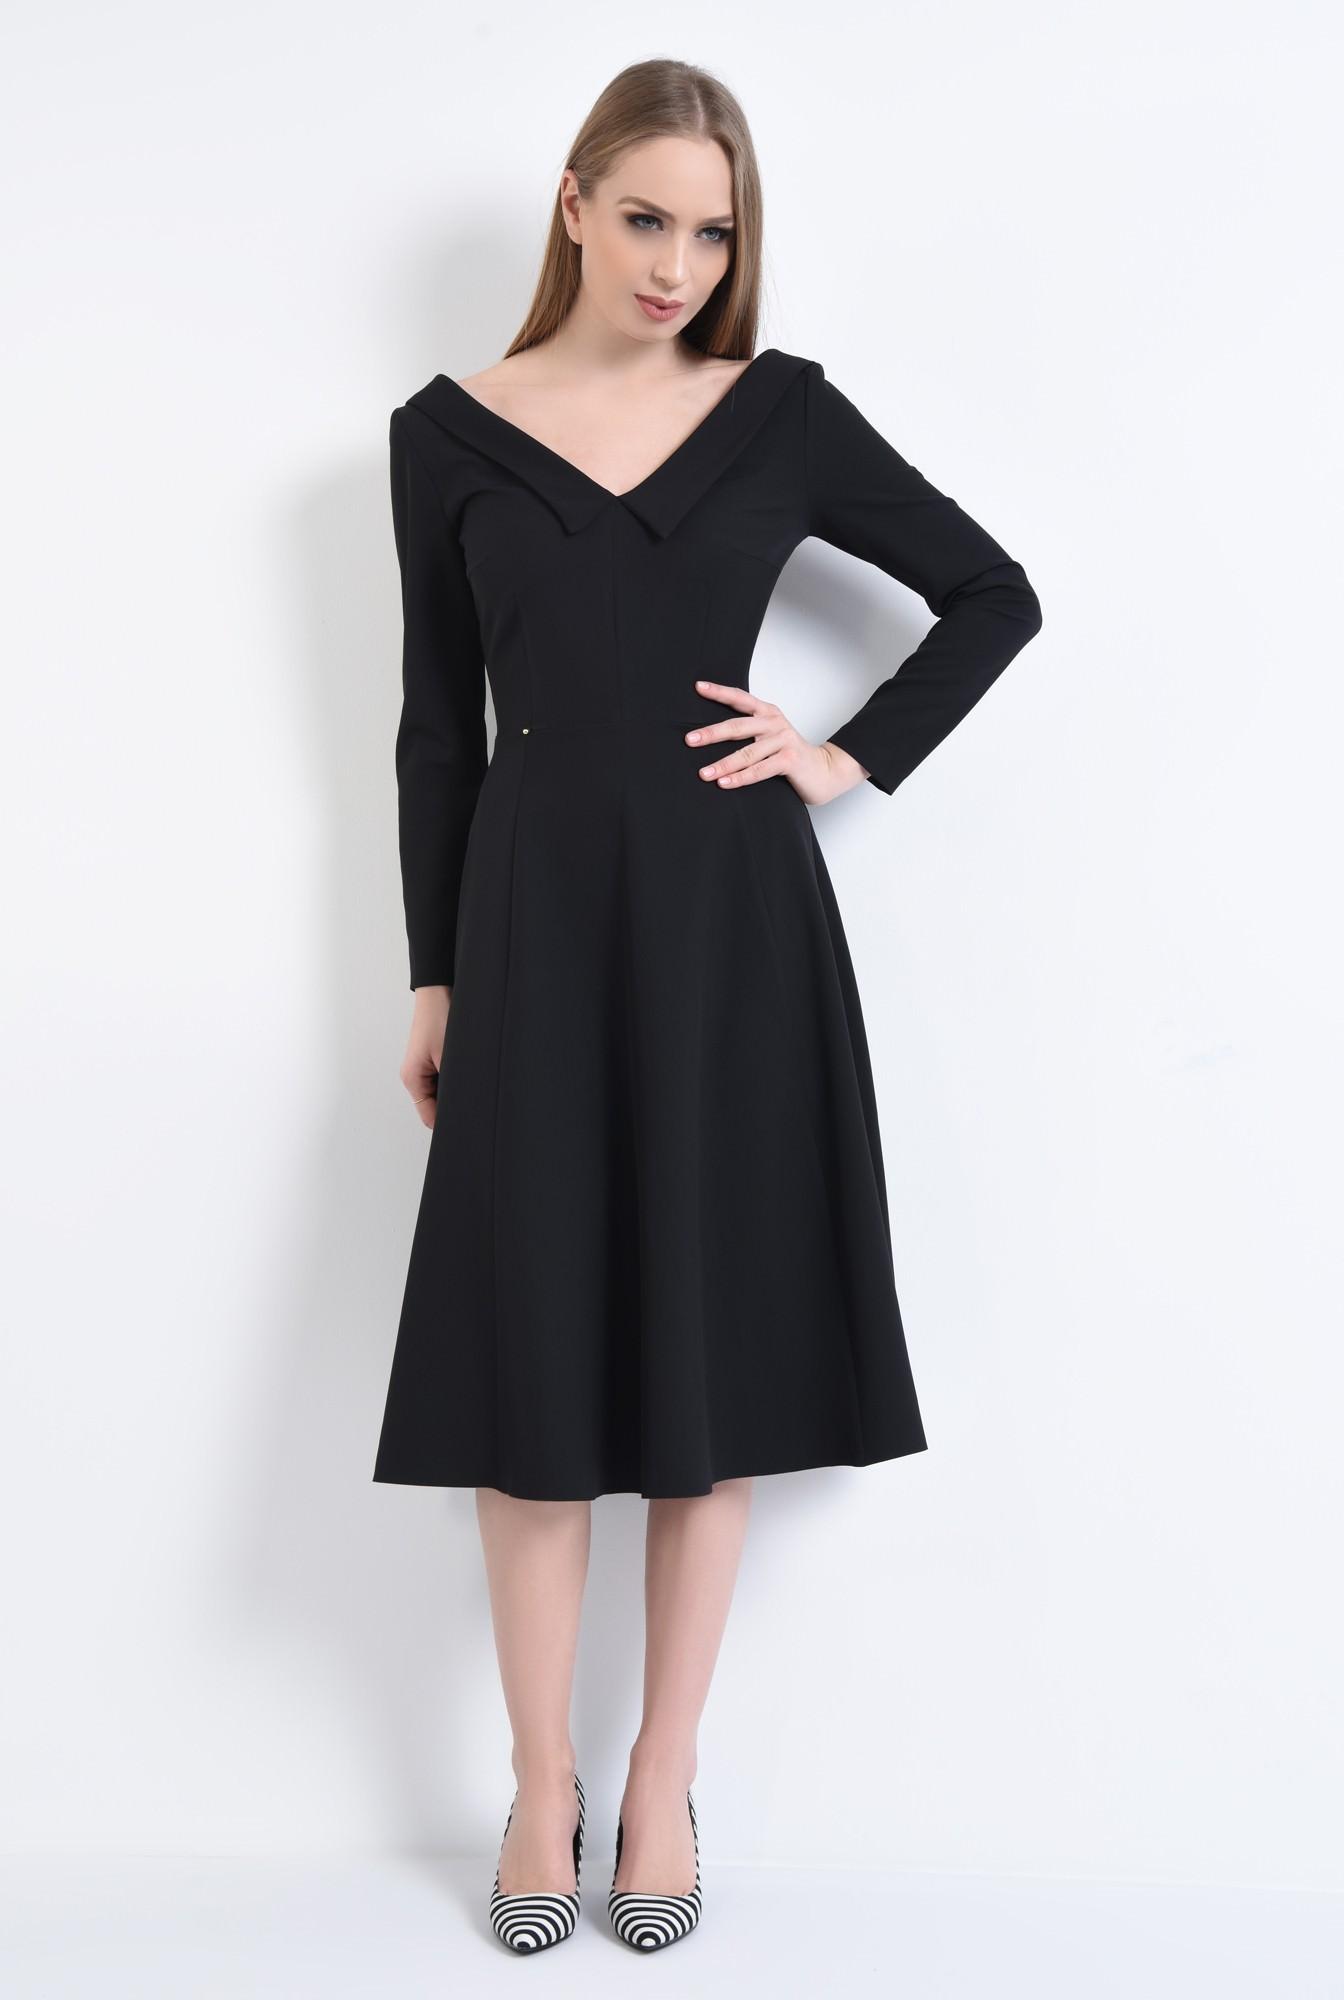 3 - Rochie eleganta, neagra